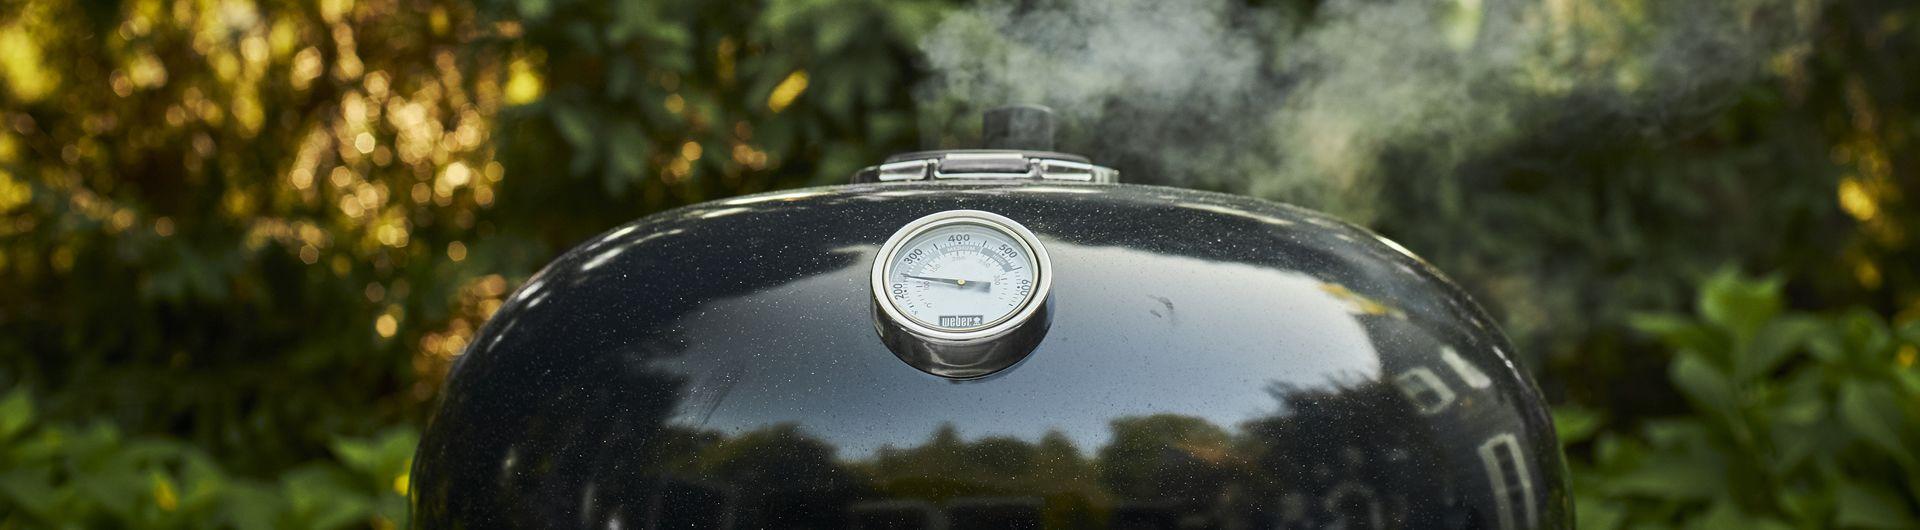 Weber Charcoal Grills